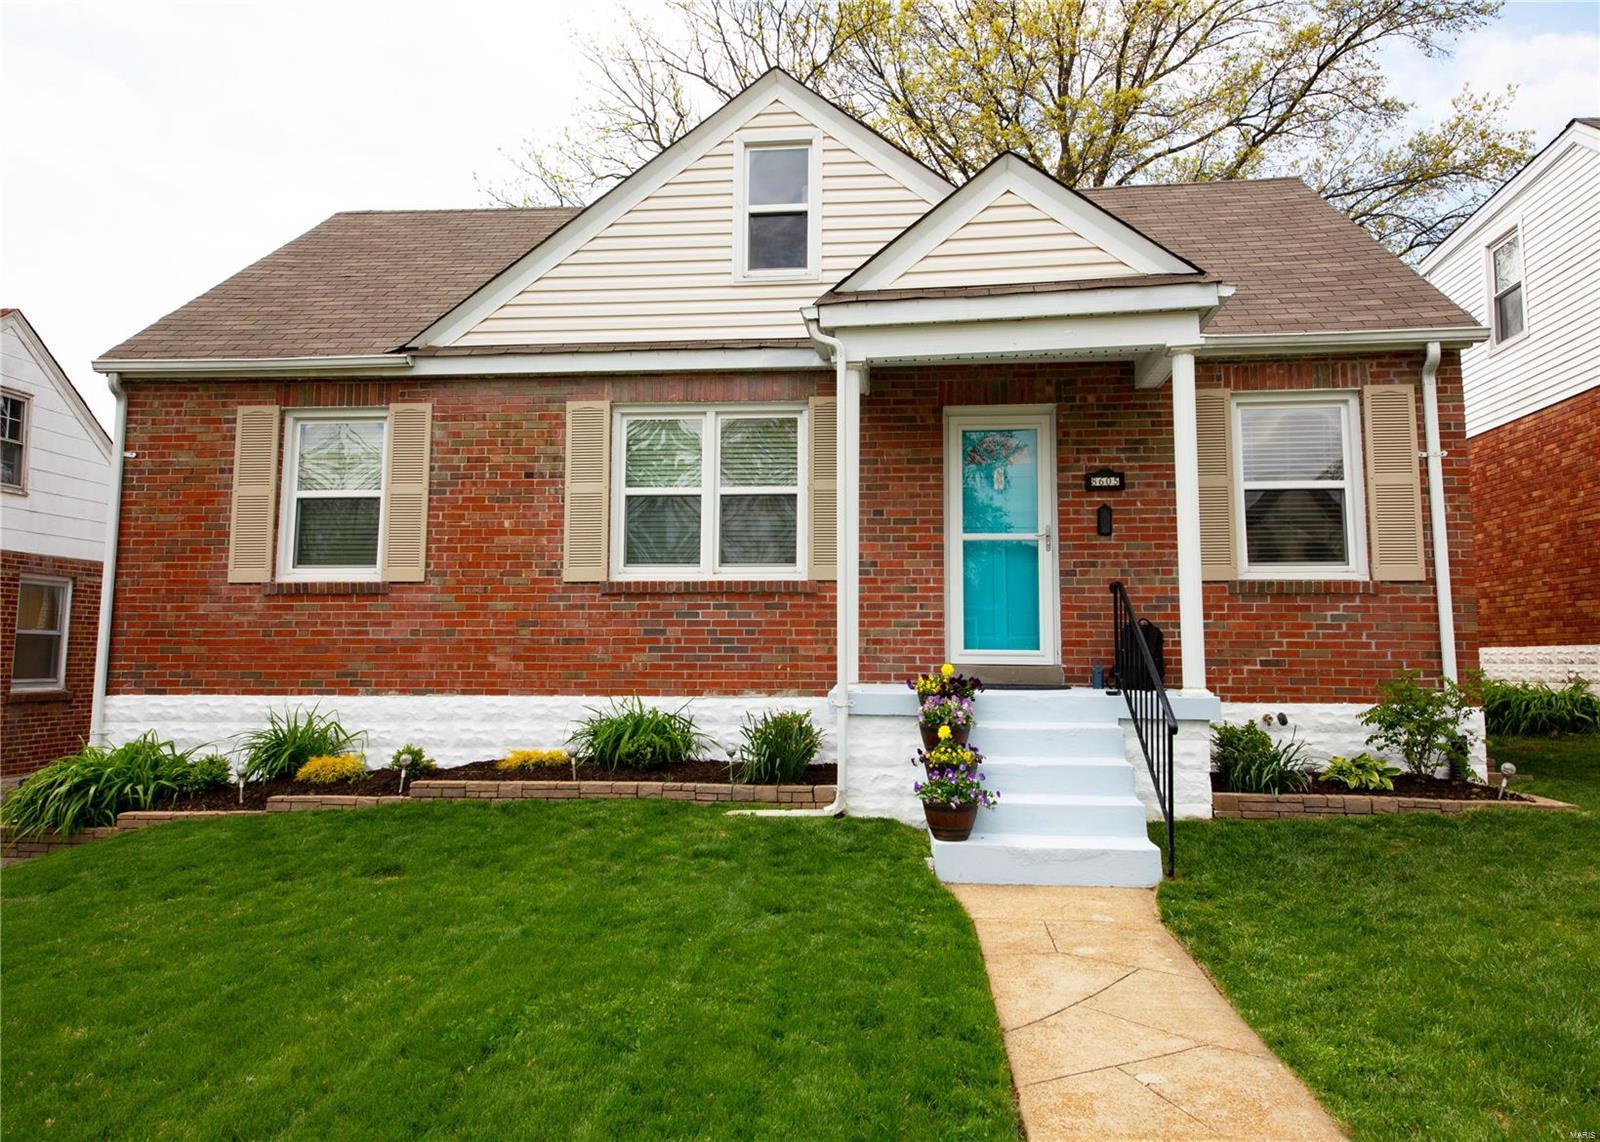 8605 Neier Property Photo - Affton, MO real estate listing